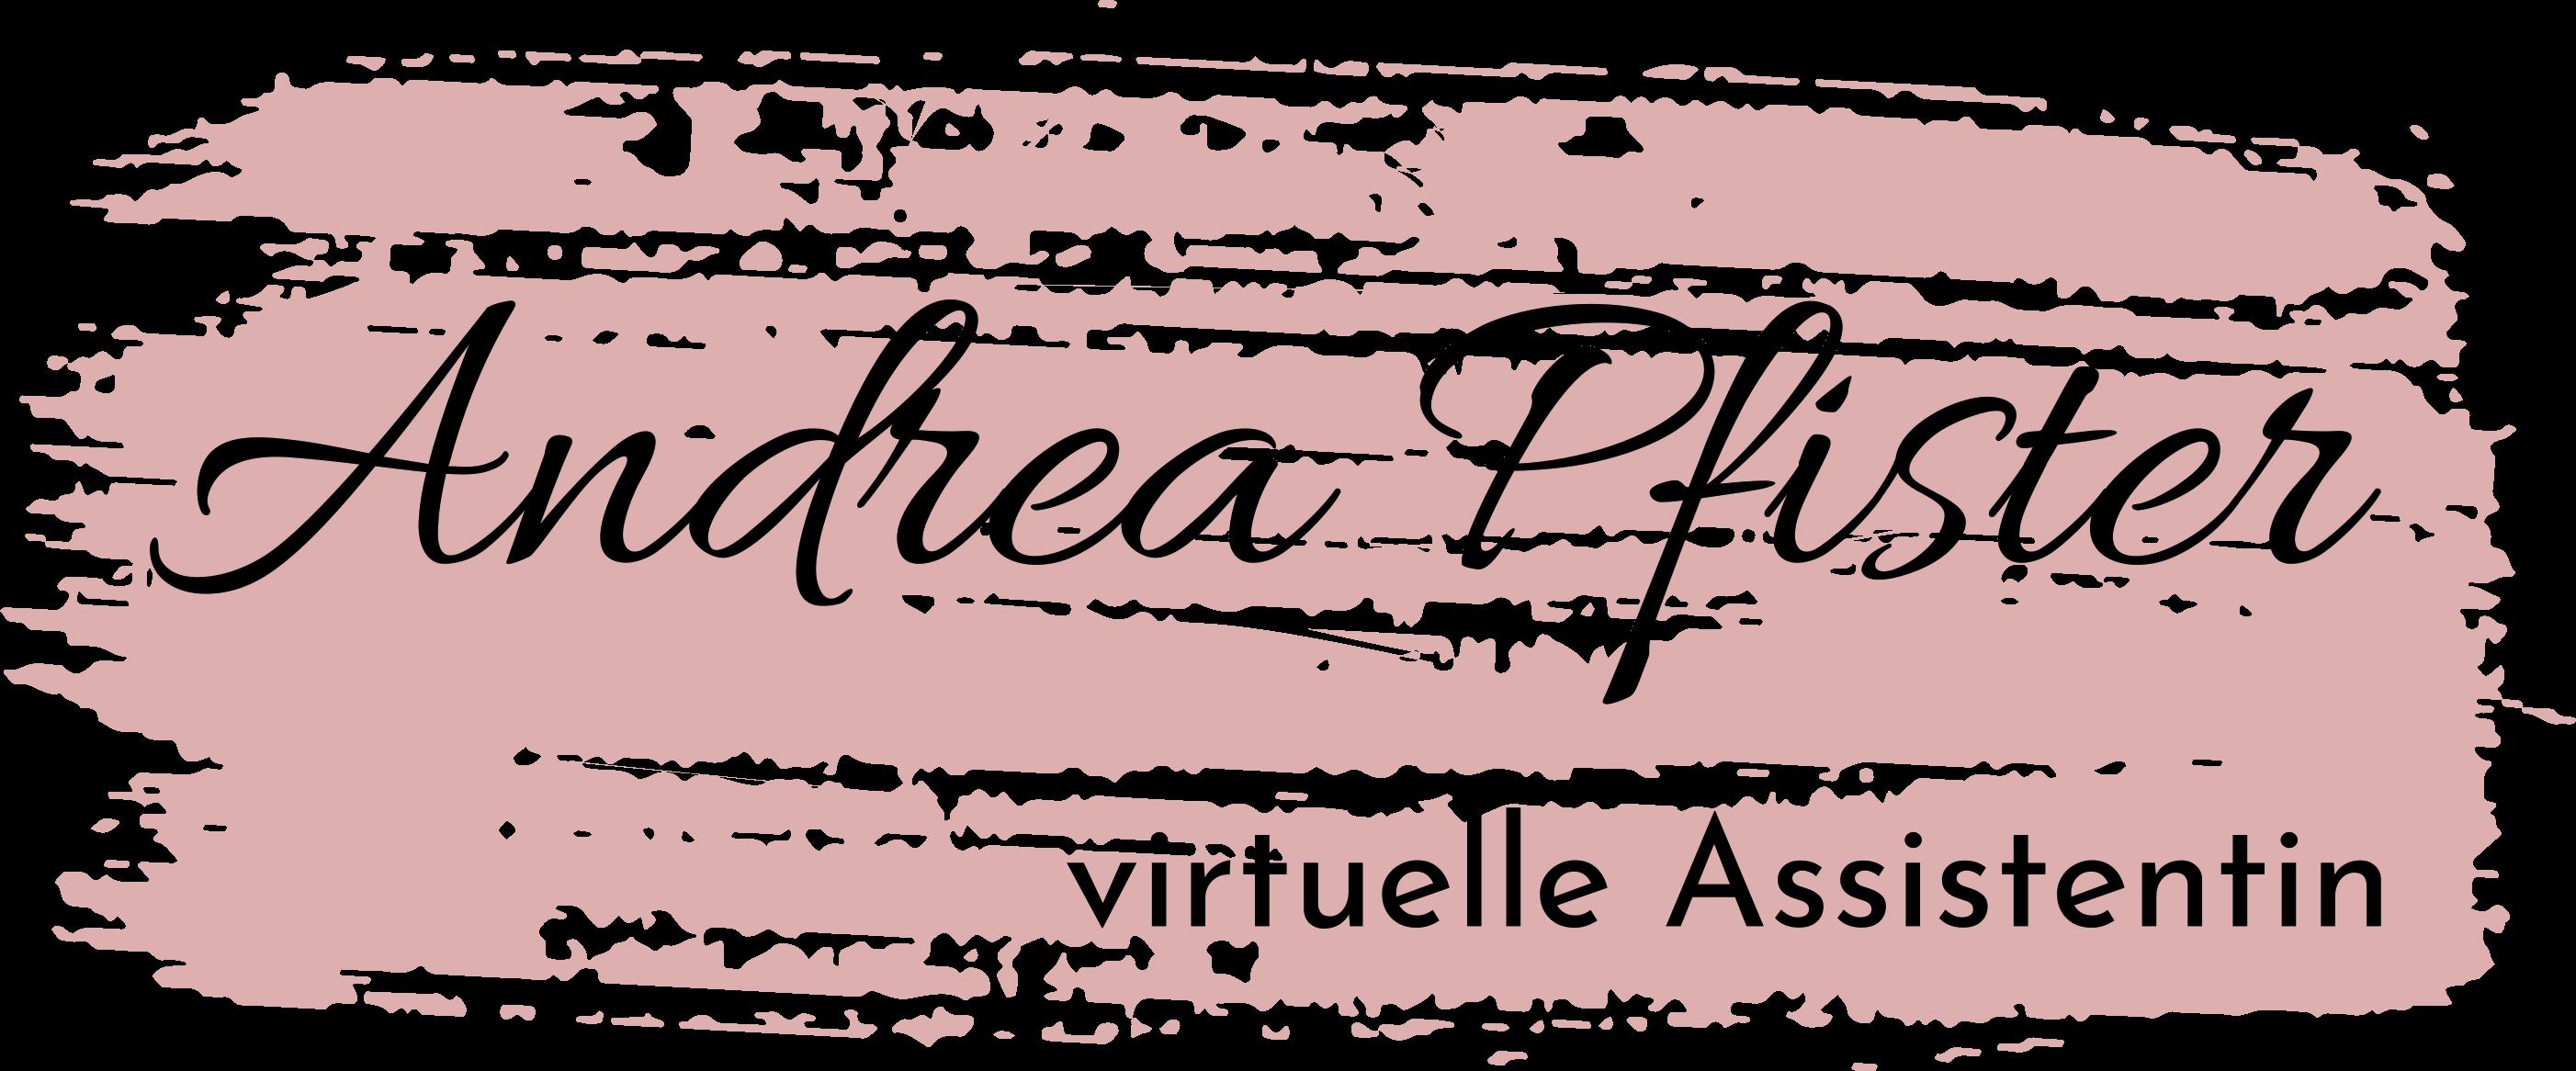 Andrea Pfister - Virtuelle Assistentin